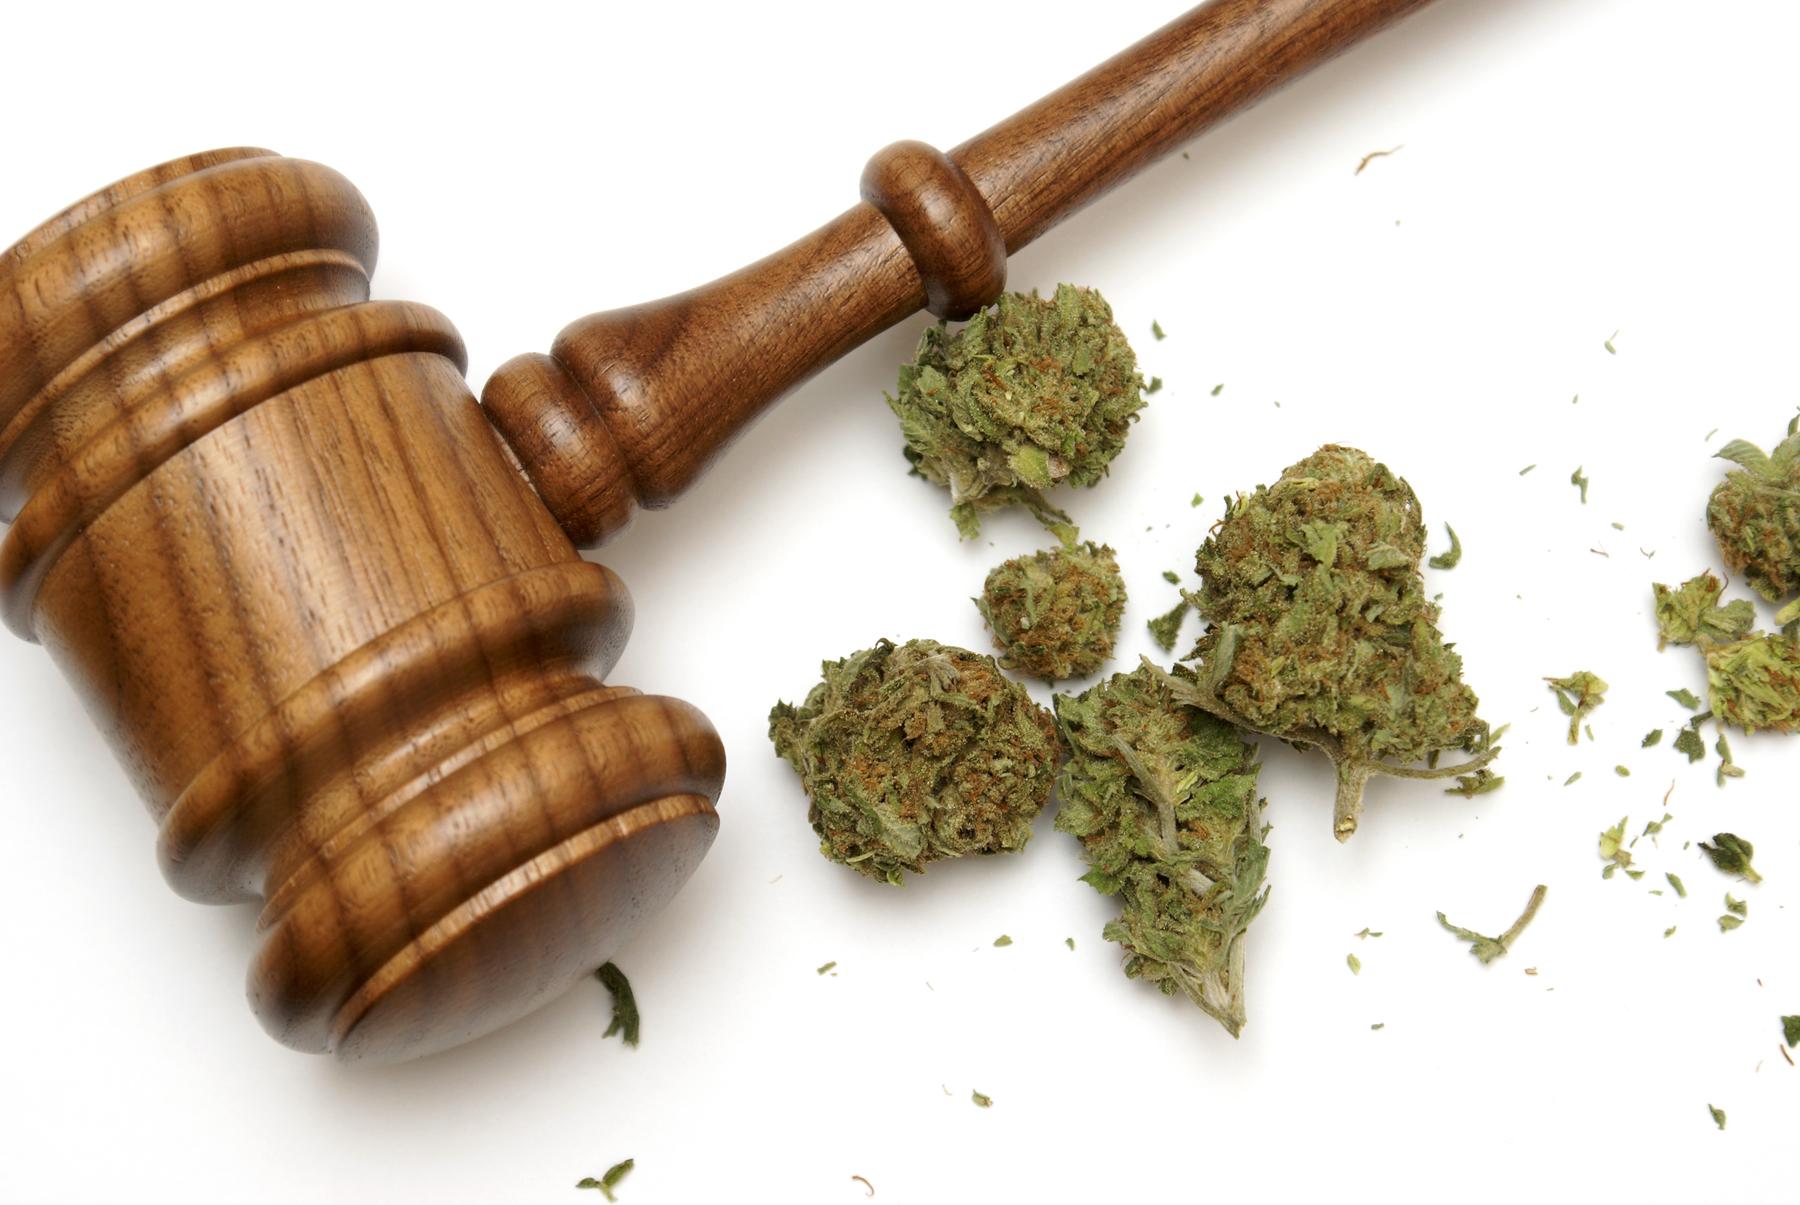 marijuana gavel credit - Shutterstock.com